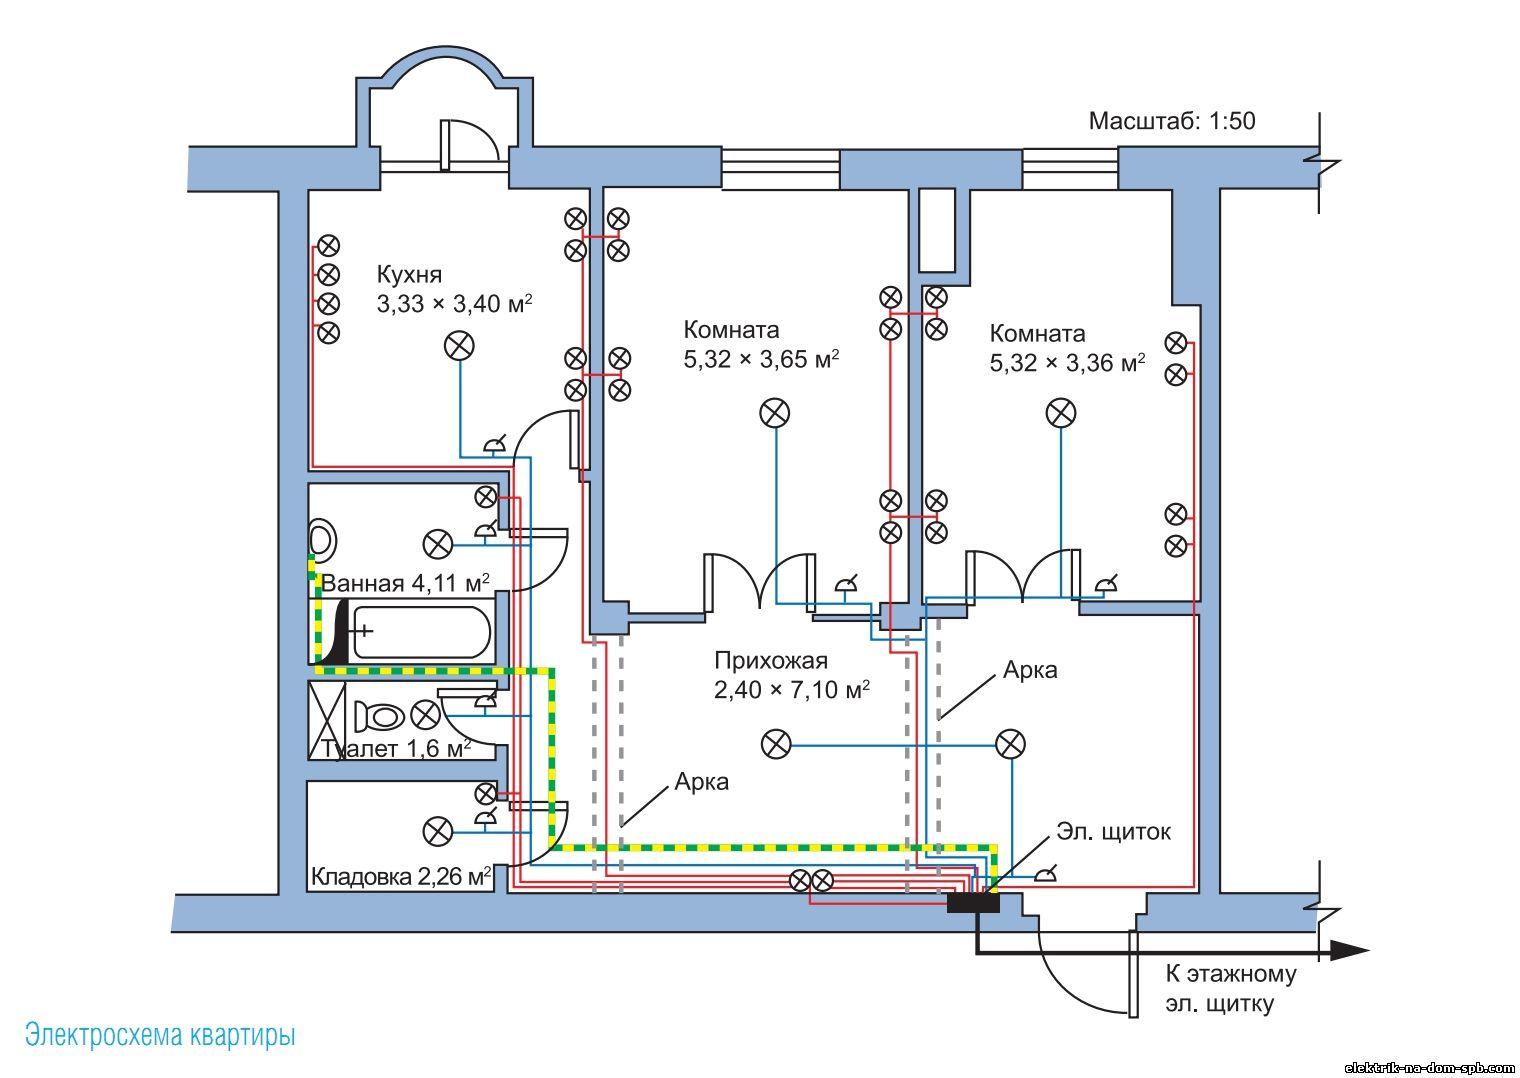 Схема электропроводки квартиры.